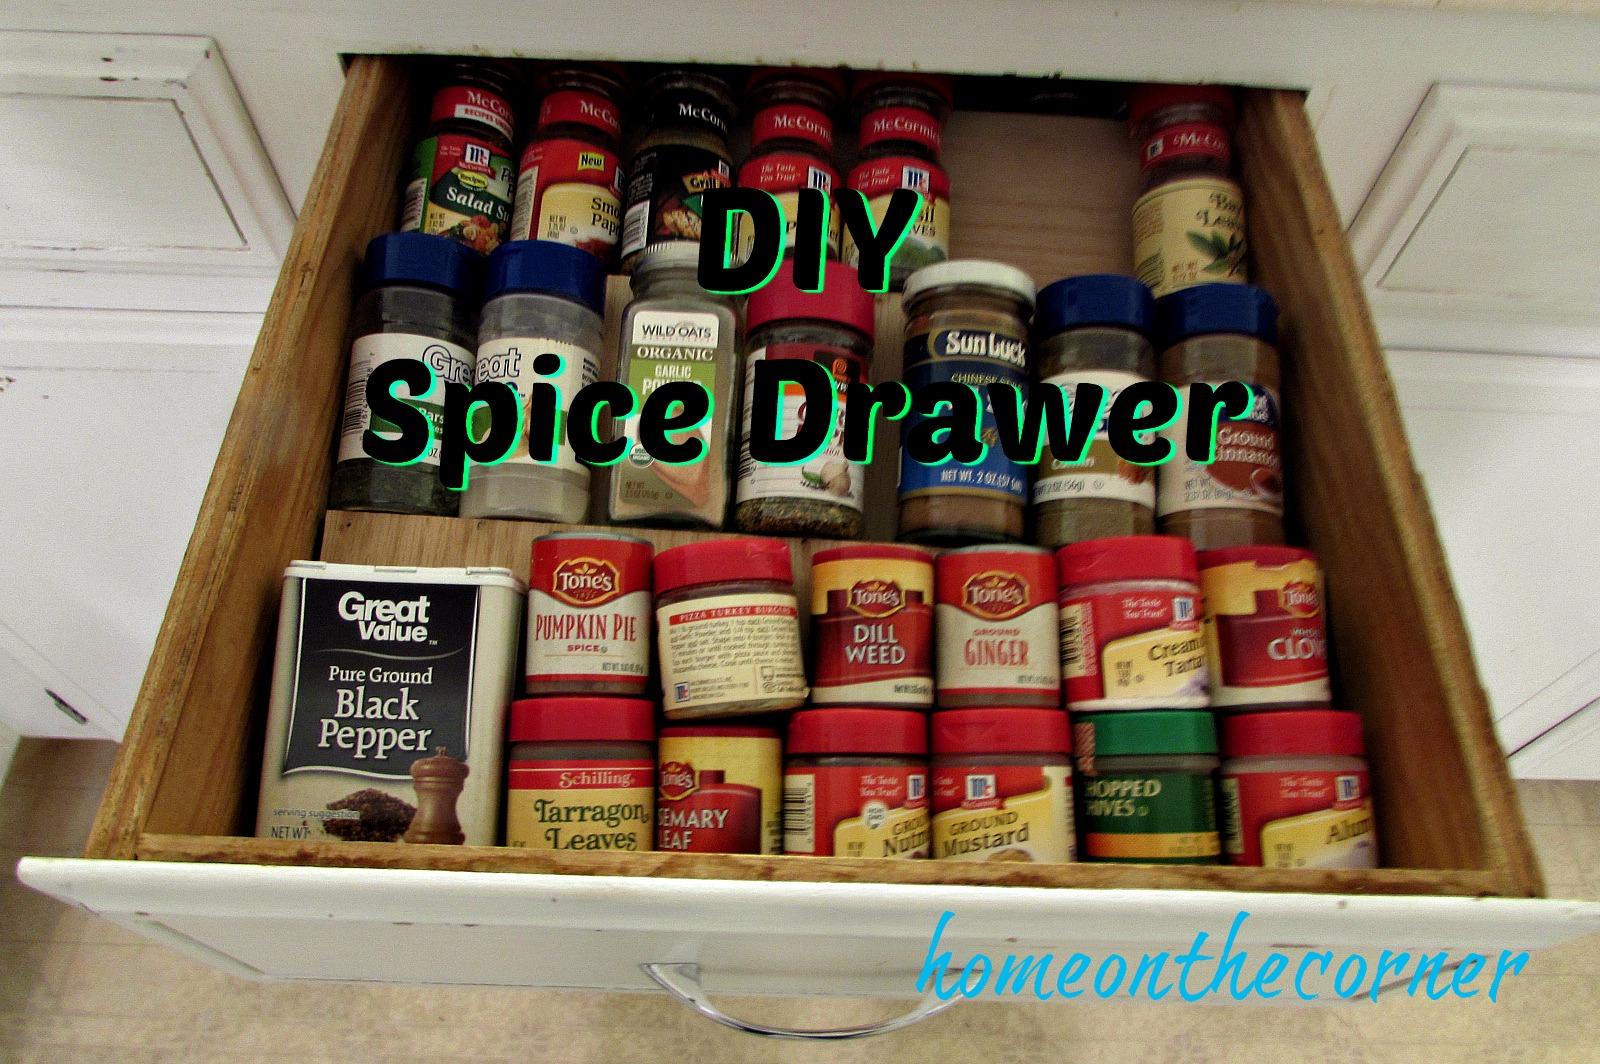 diy-spice-drawer-title